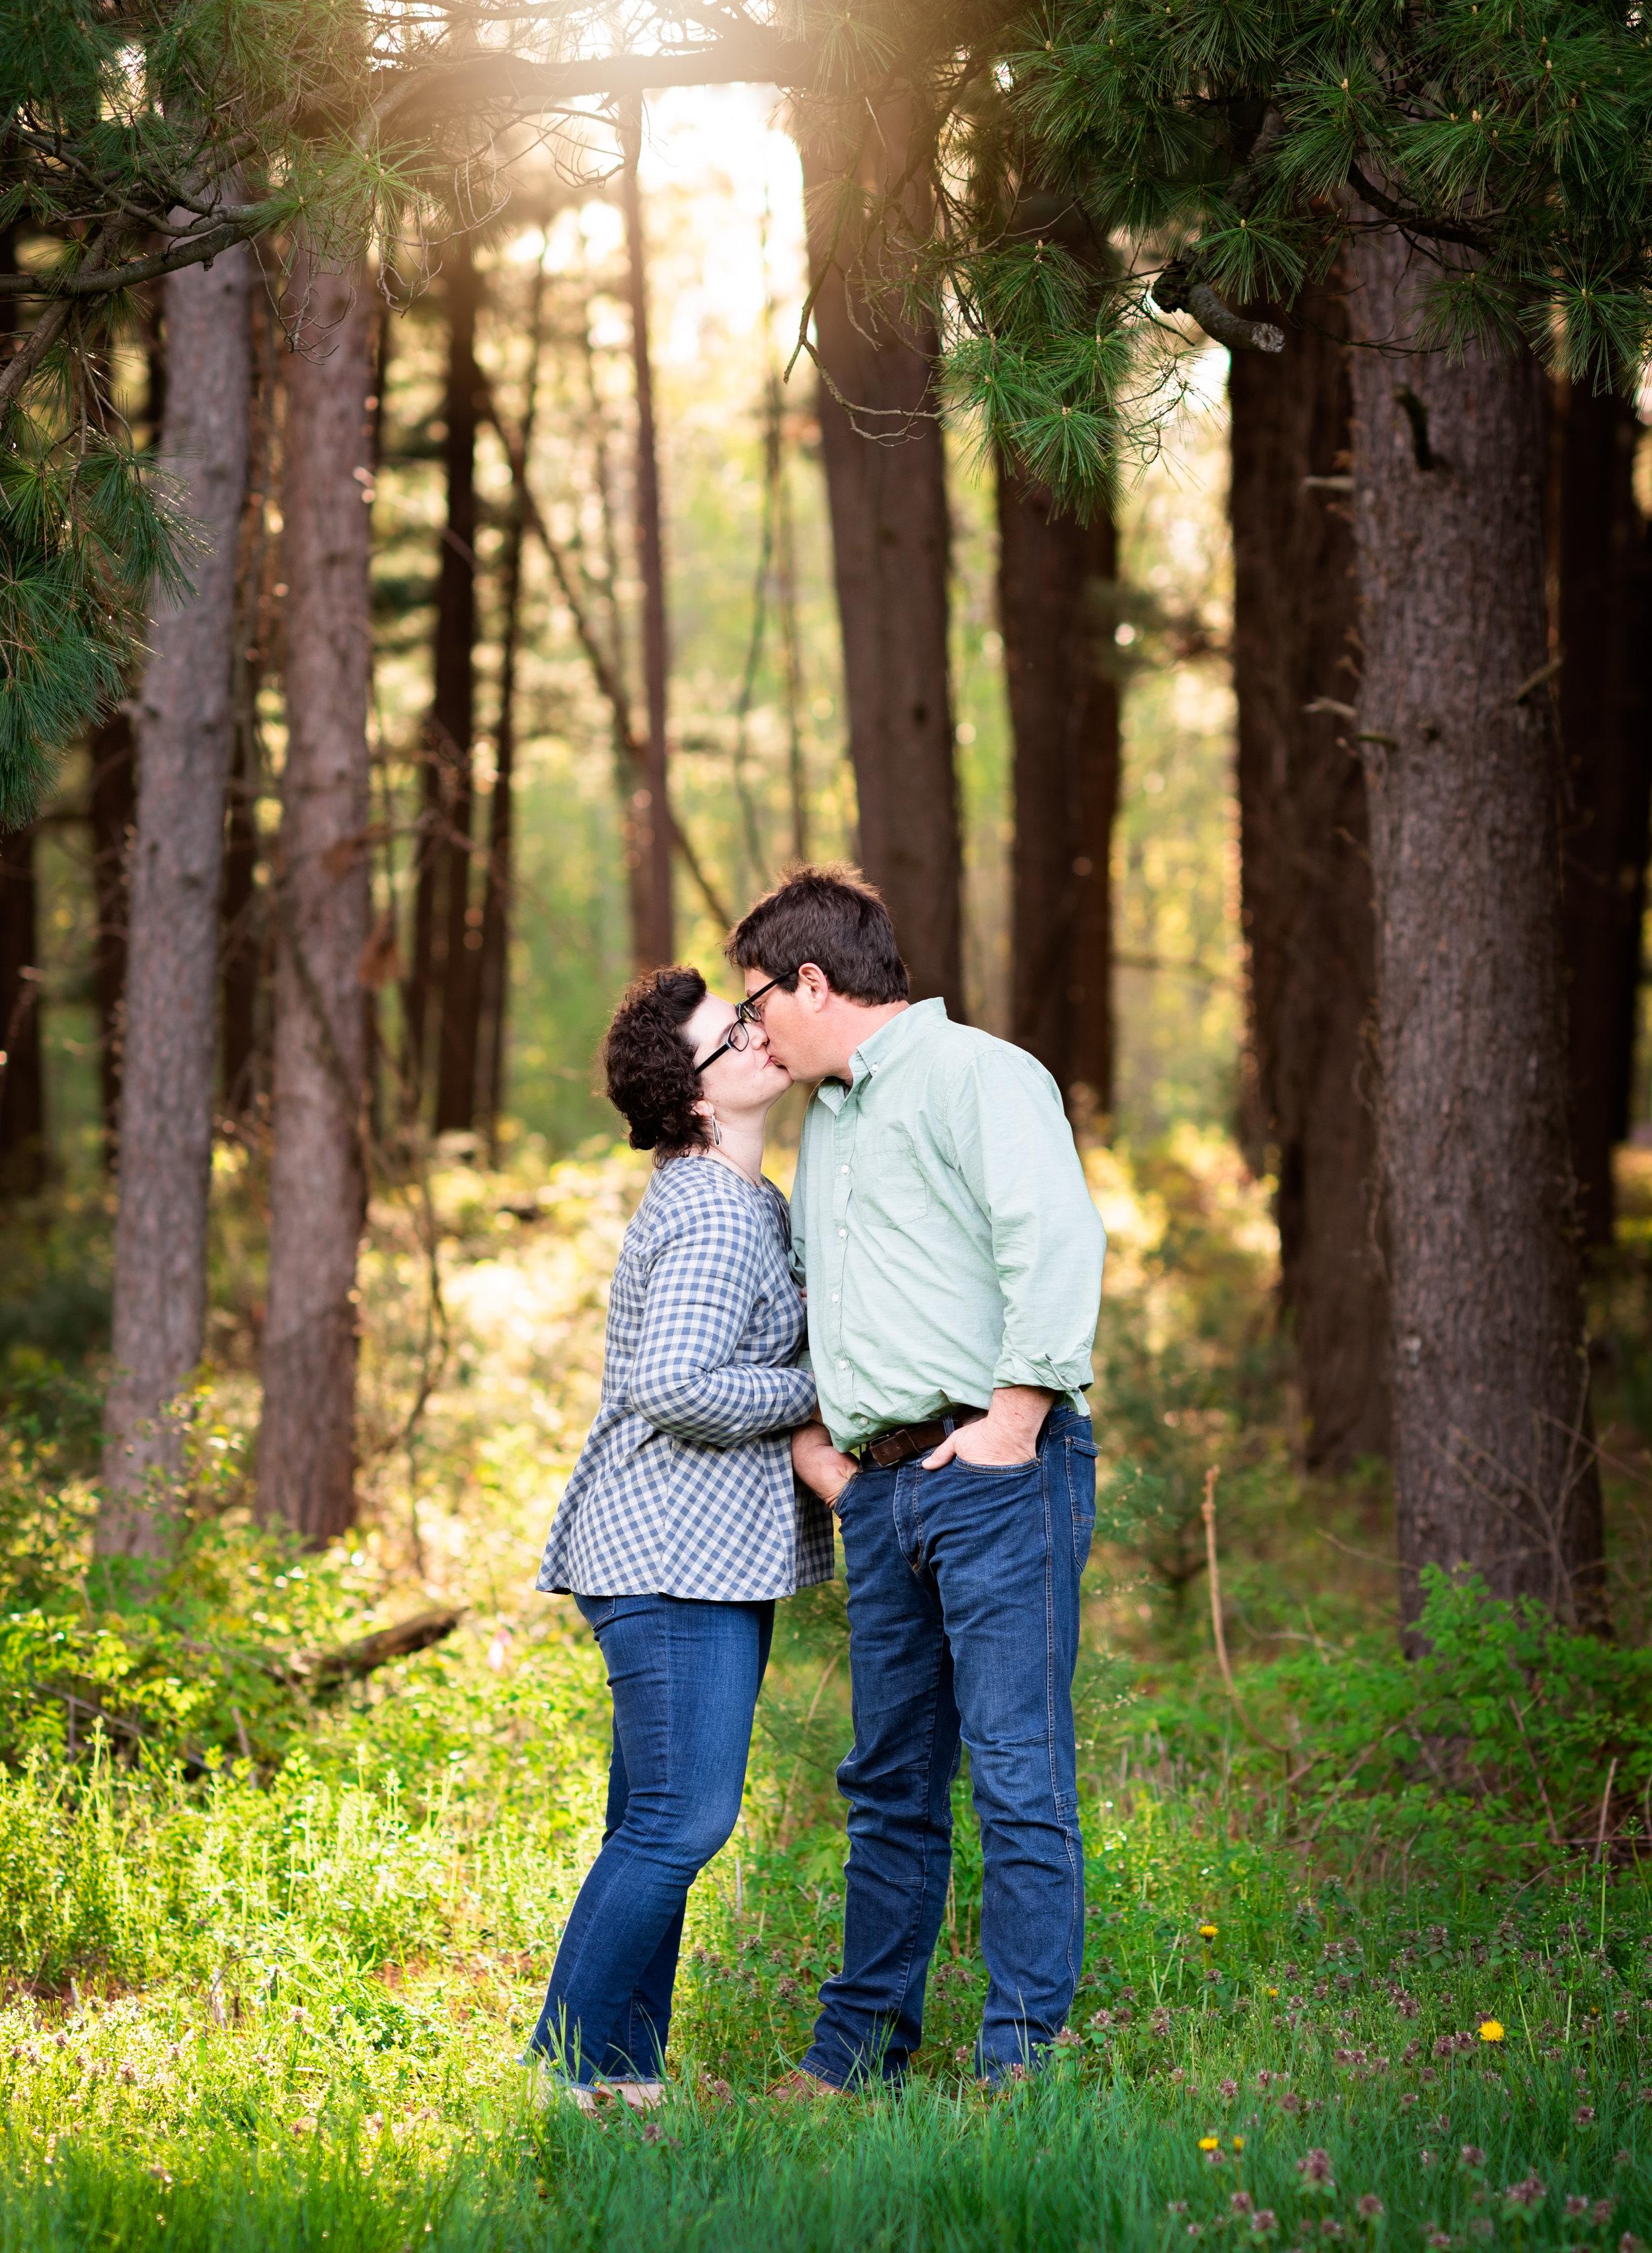 #4_Kissing.jpg